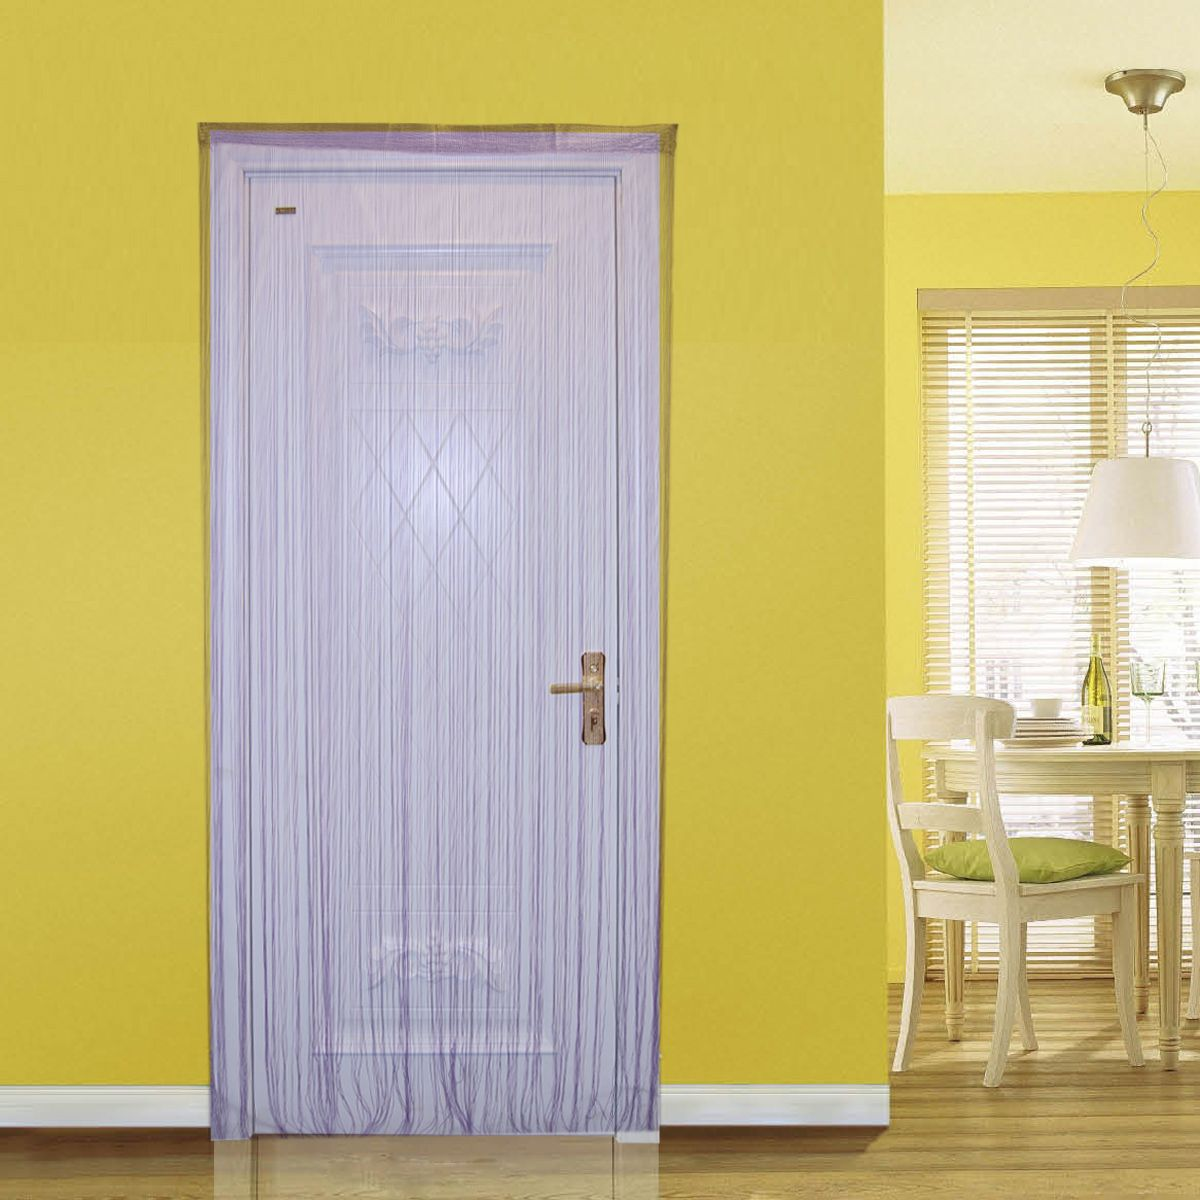 Decorative color string curtain m door window tassel curtain